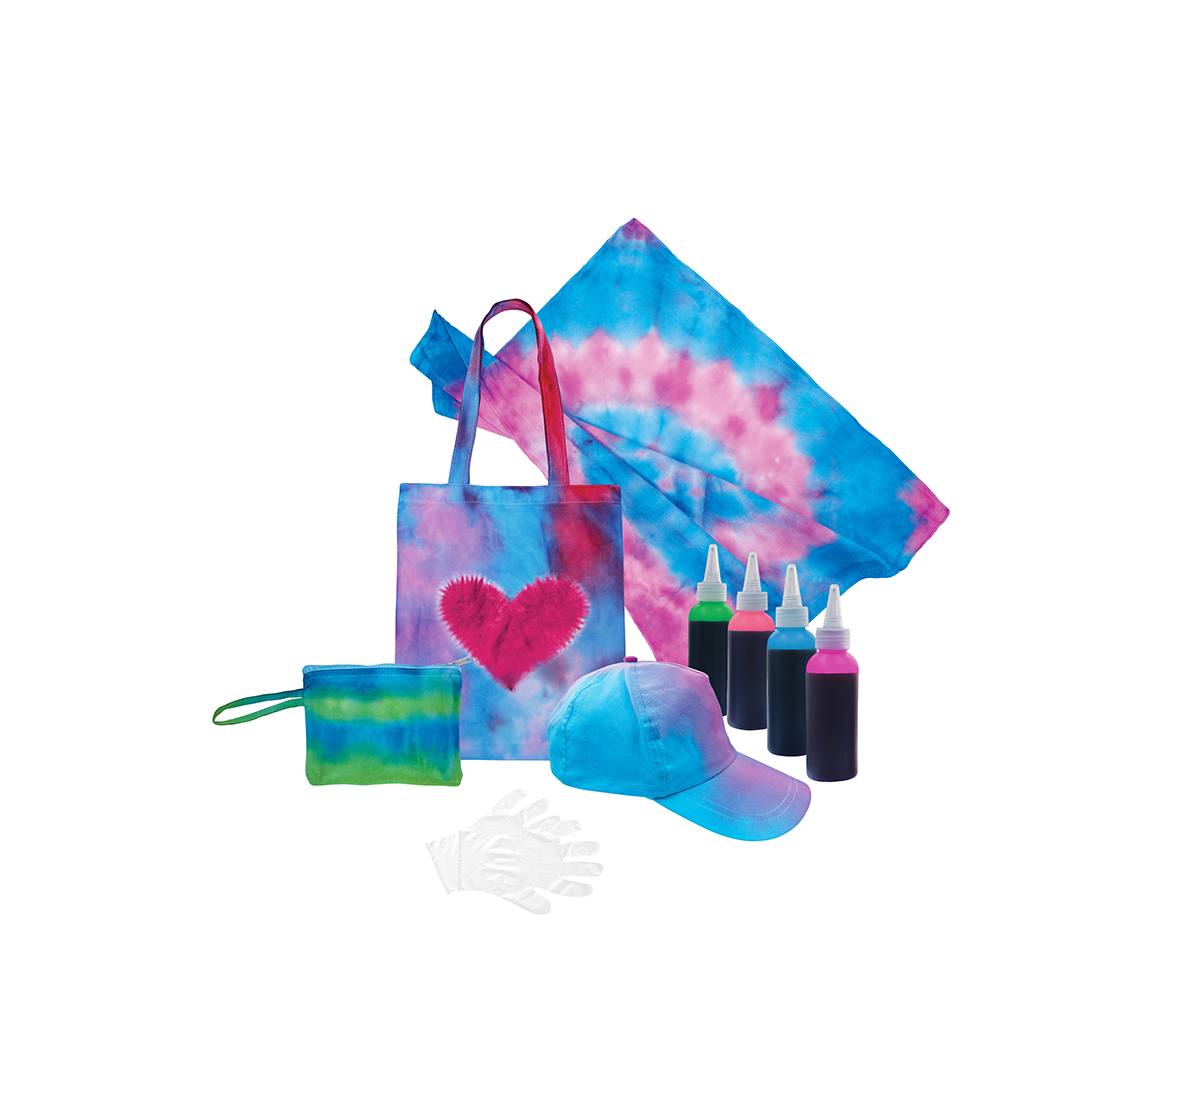 Youreka | Youreka Tie Dye Colour Burst Kit DIY Art & Craft Kits for Kids age 3Y+